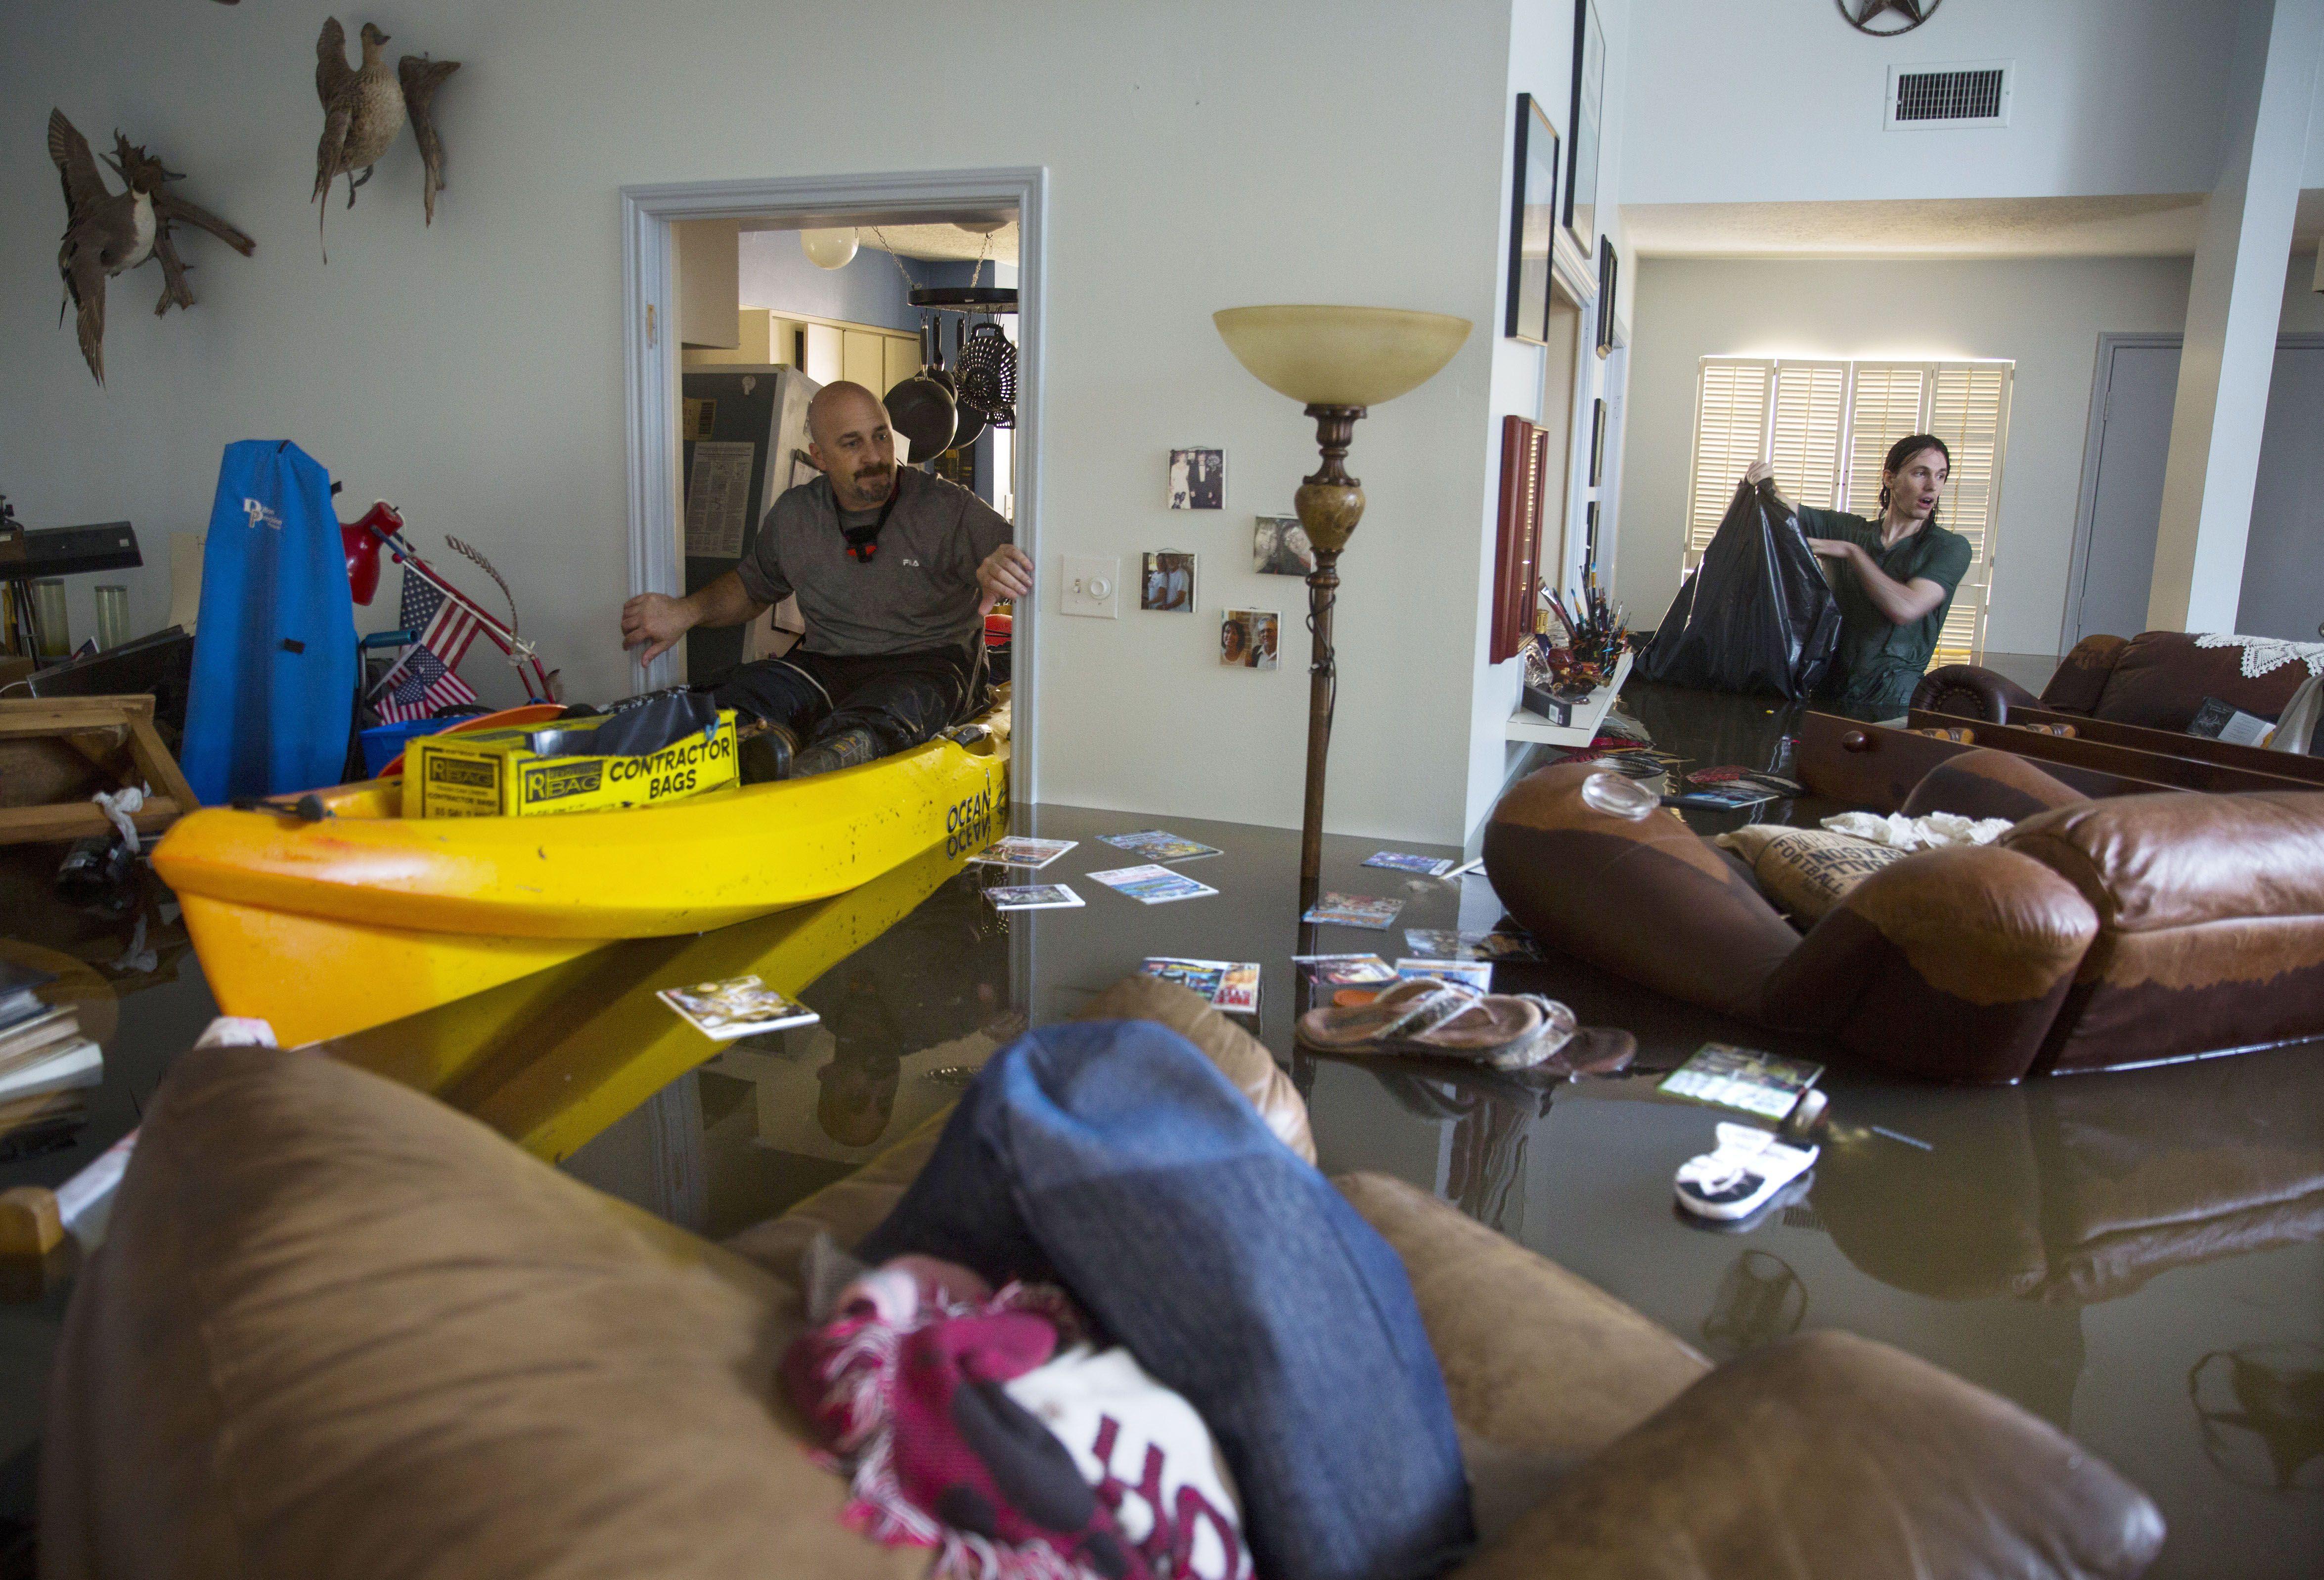 Before harvey houston sought funding to mitigate floods